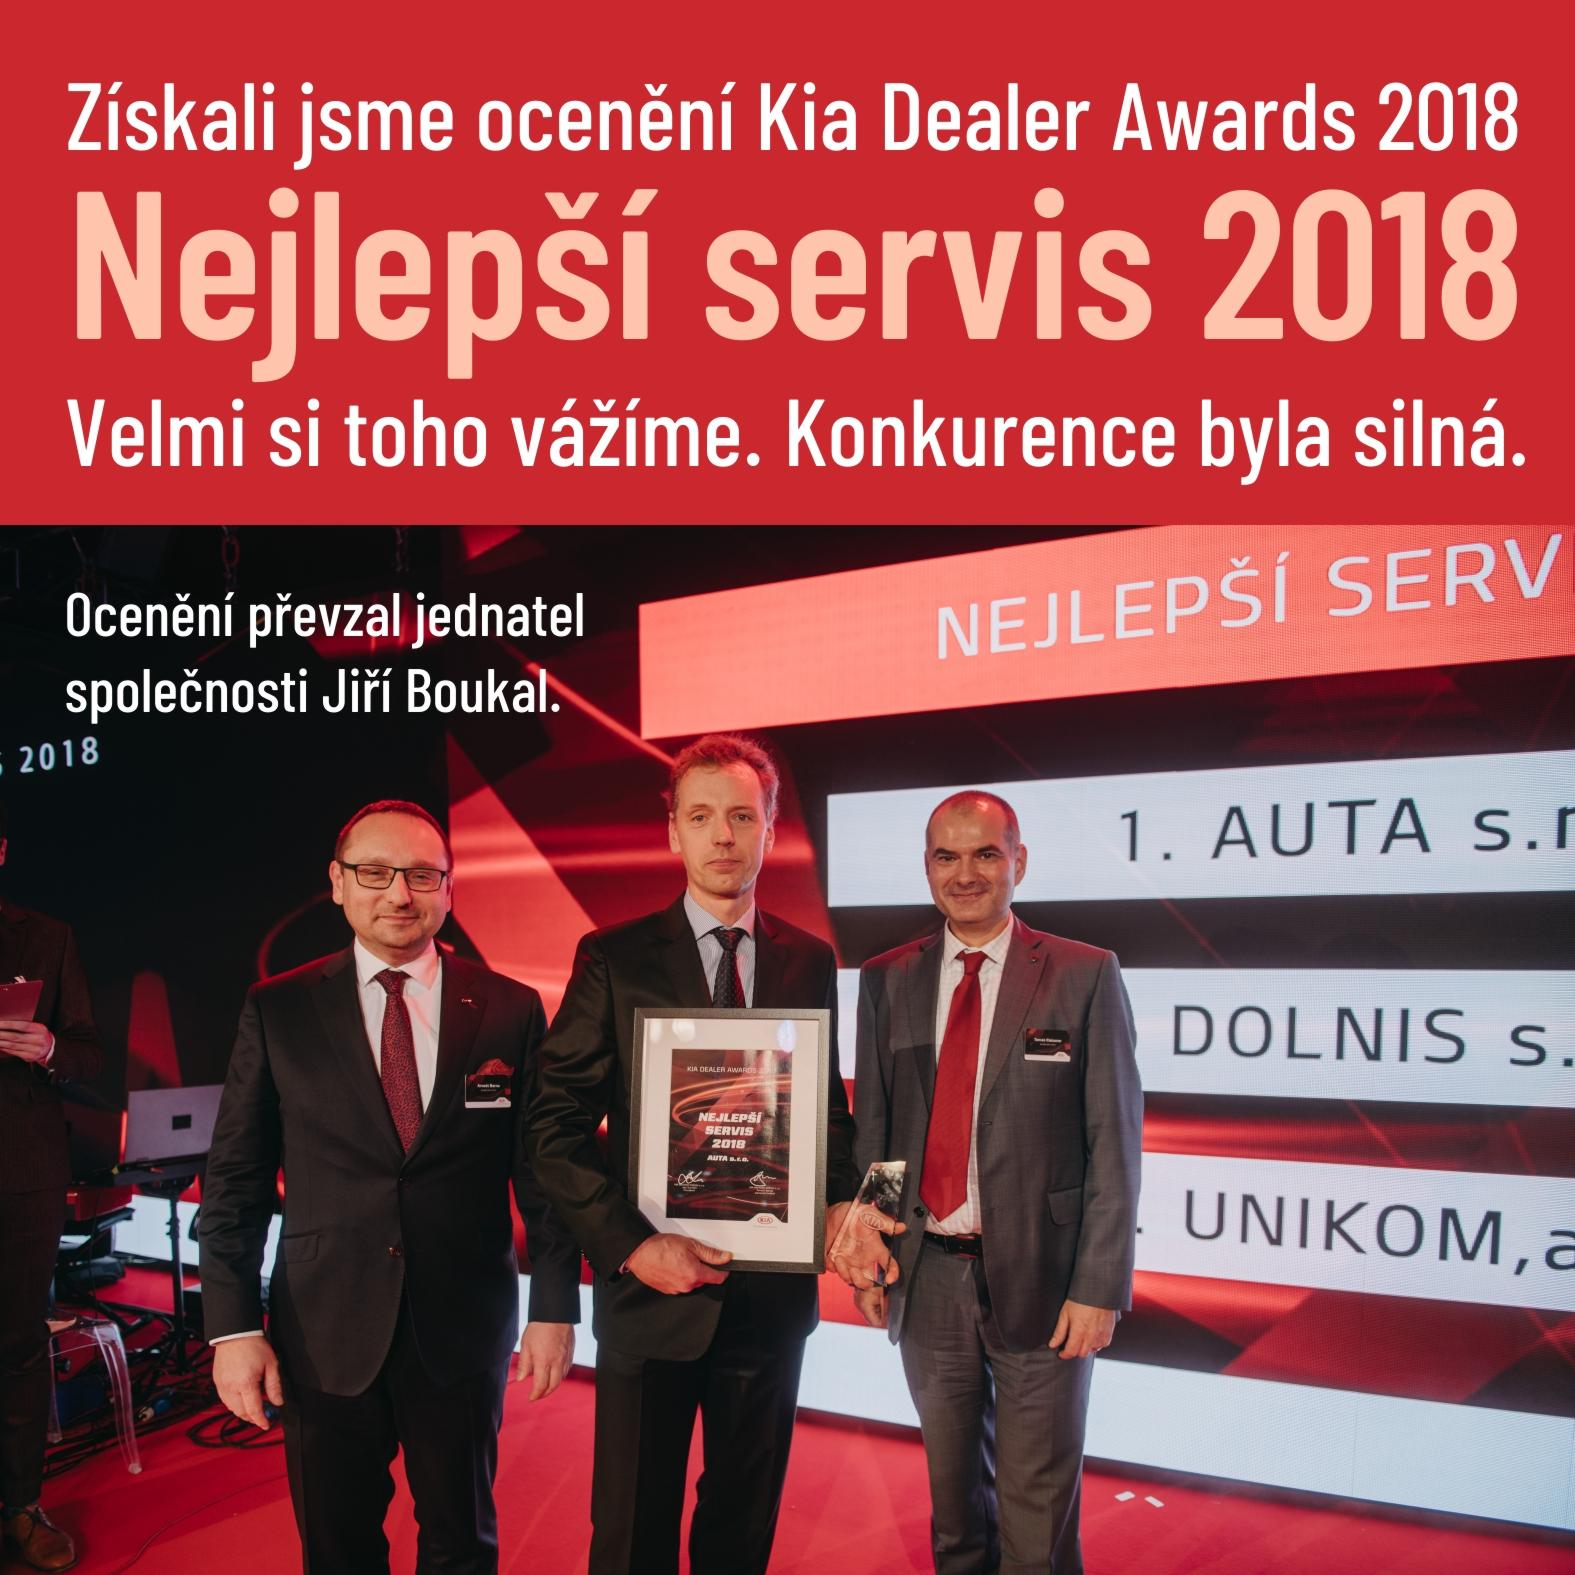 Nejlepší servis Kia v roce 2018